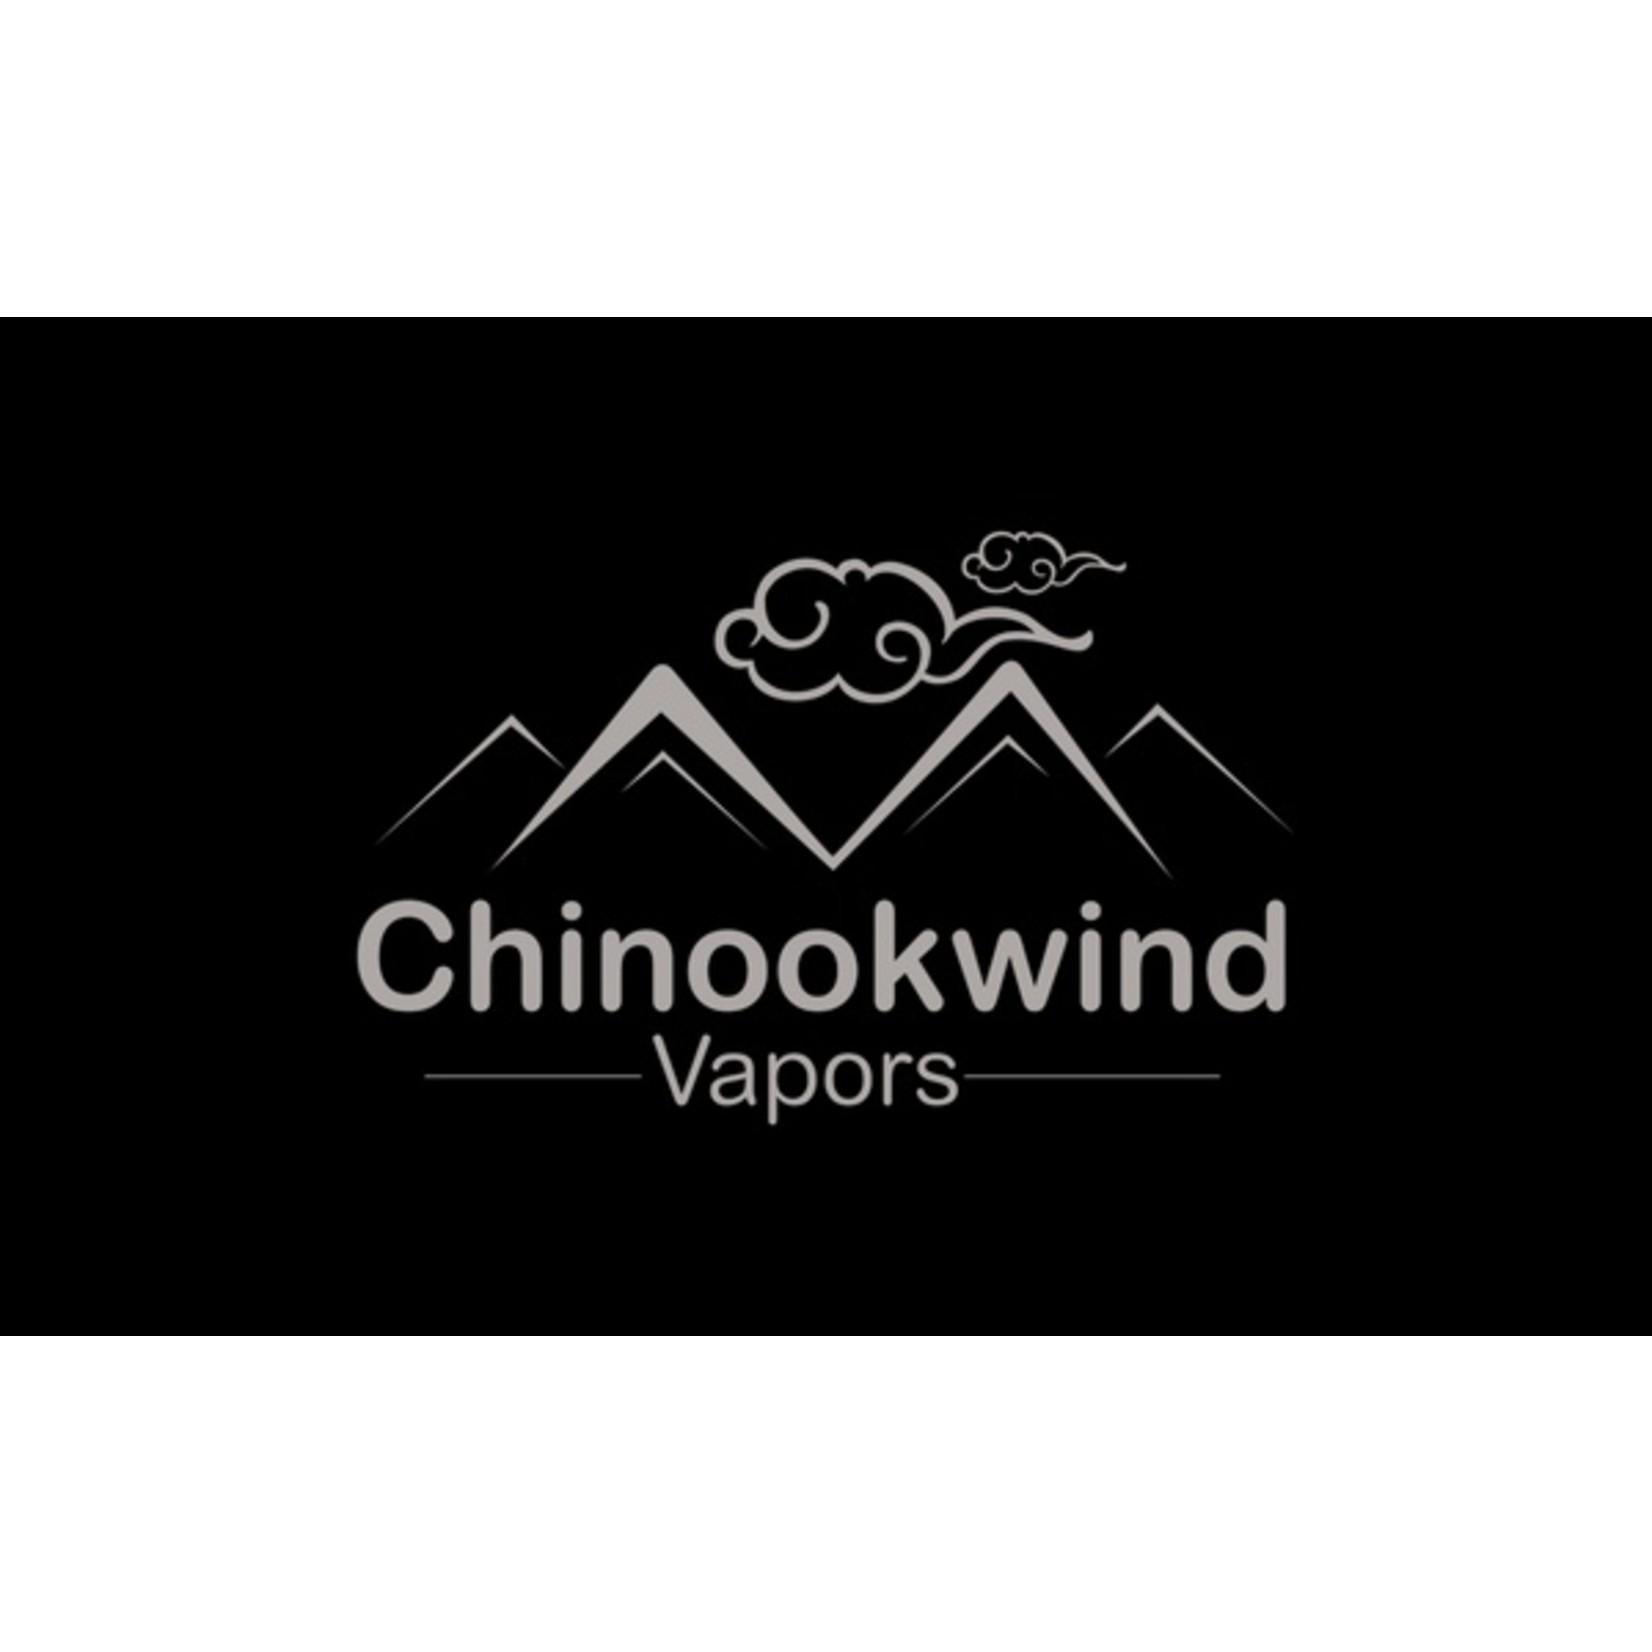 Chinookwind Vapor Fuzzy Peach